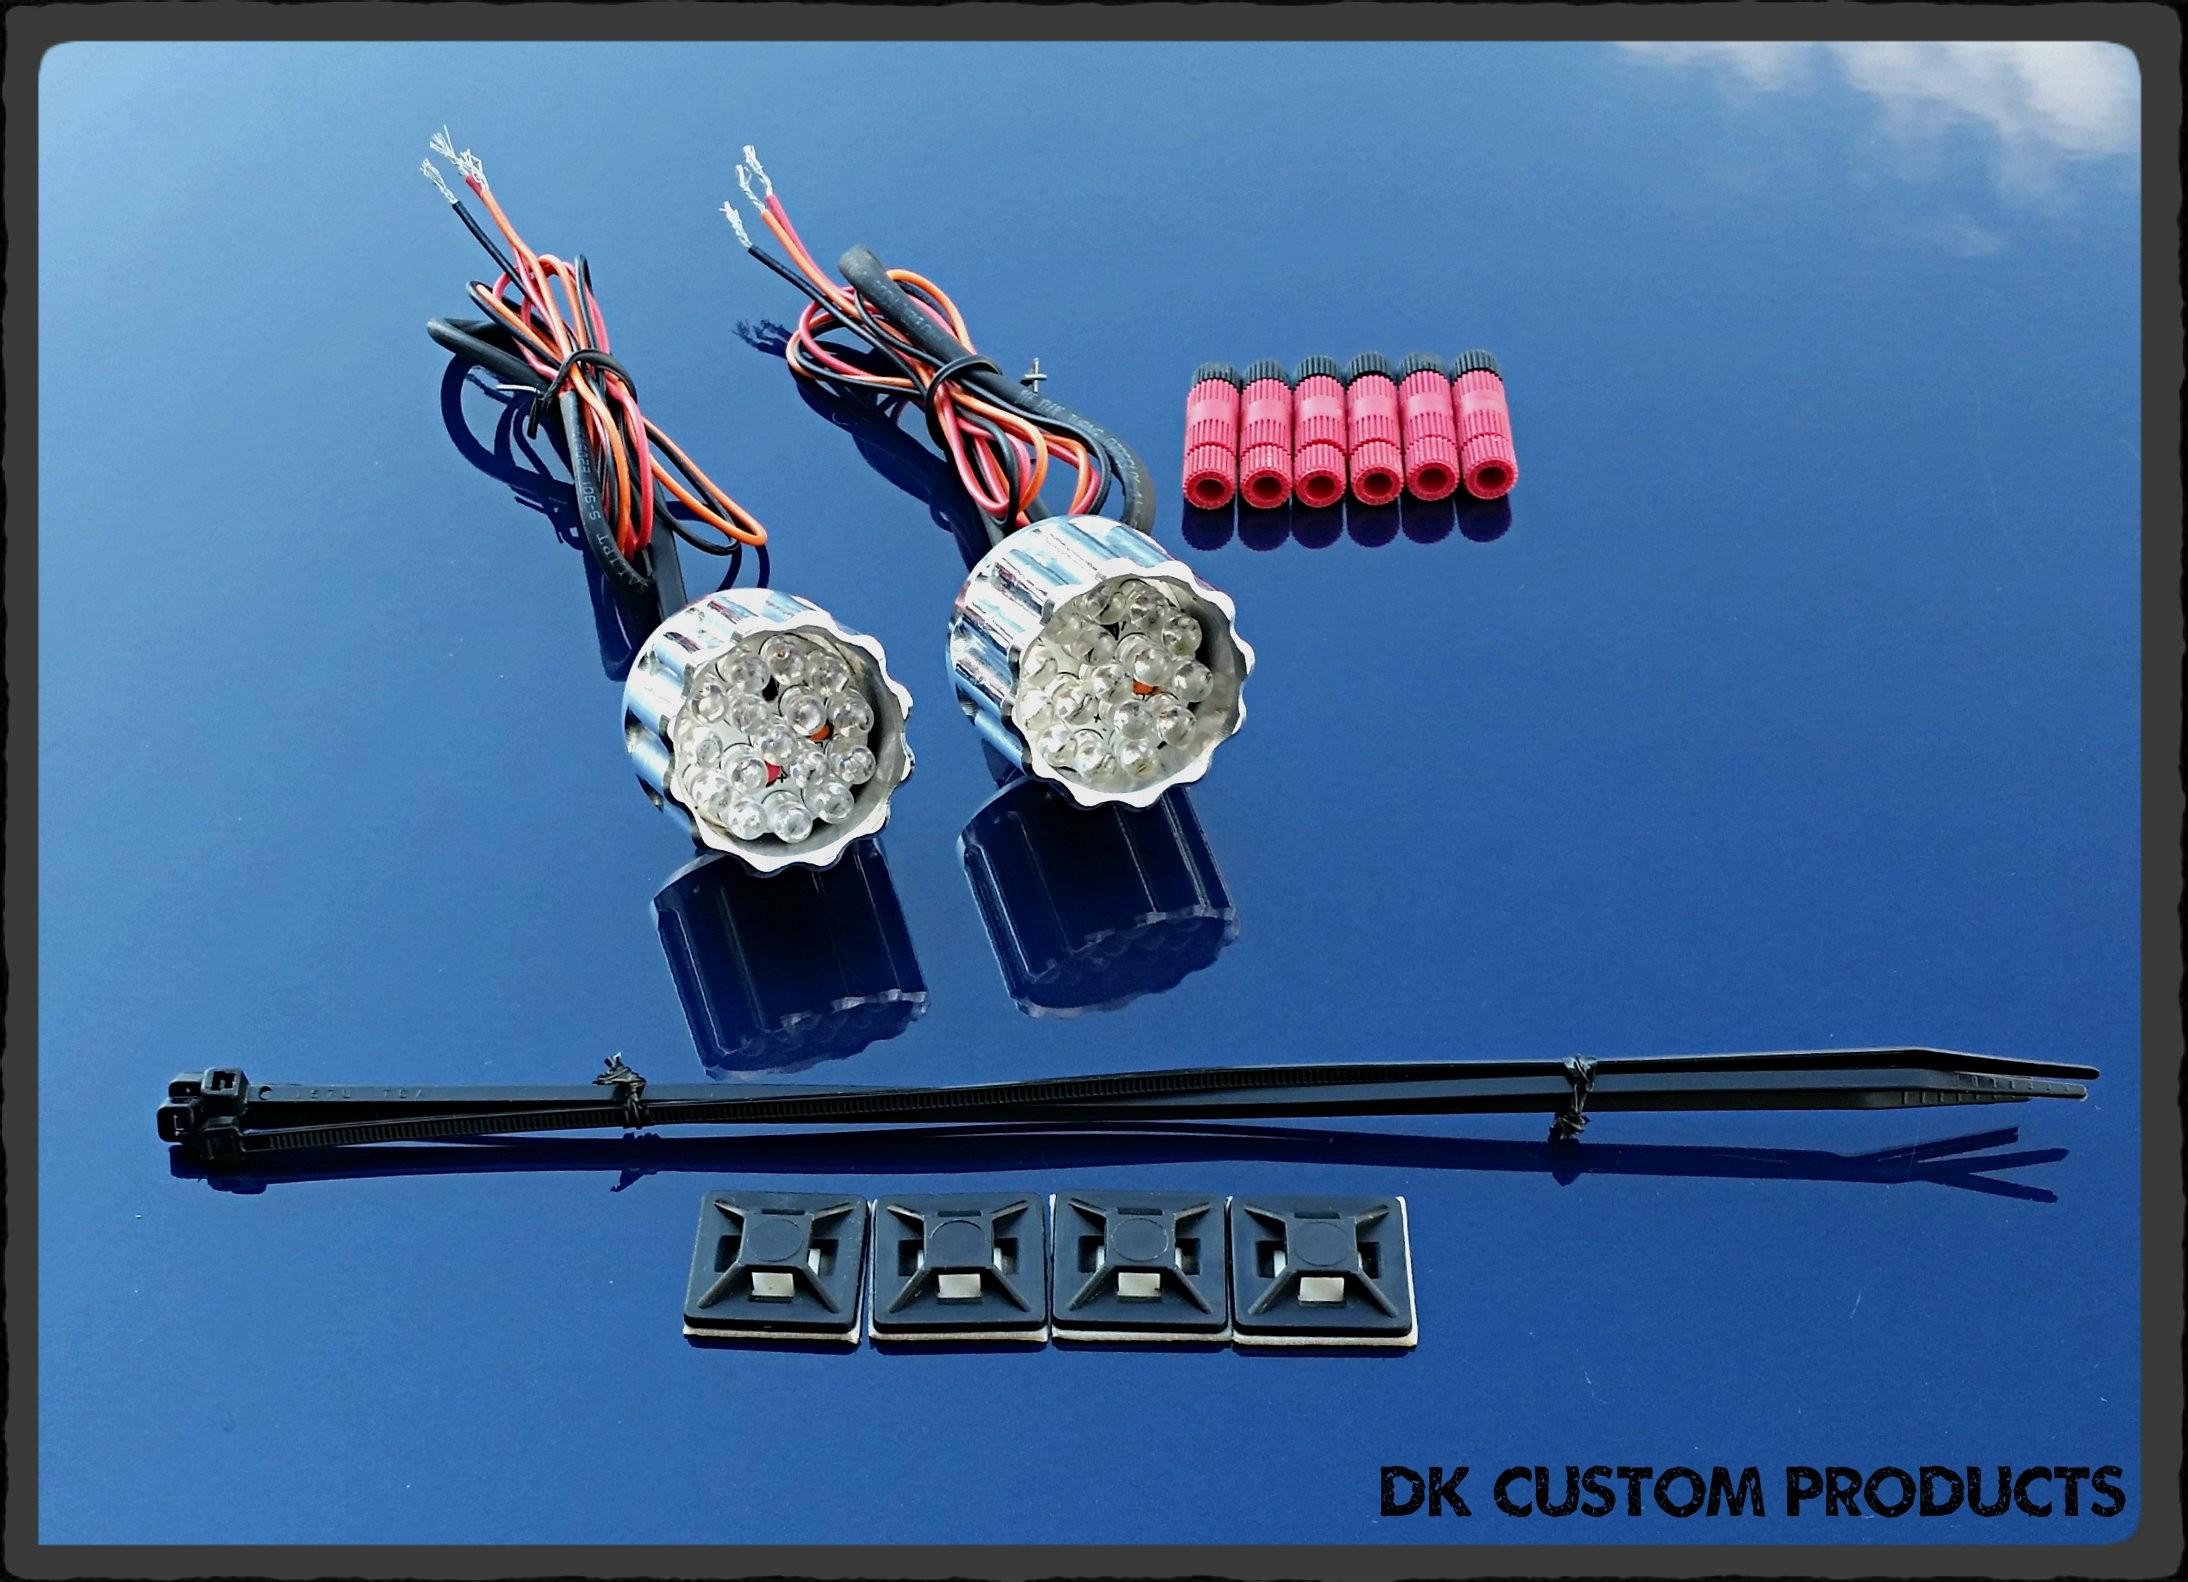 DK Custom 22LR Billet Run Brake Turn LED Lights Black Polished Harley Sportster Dyna Softail